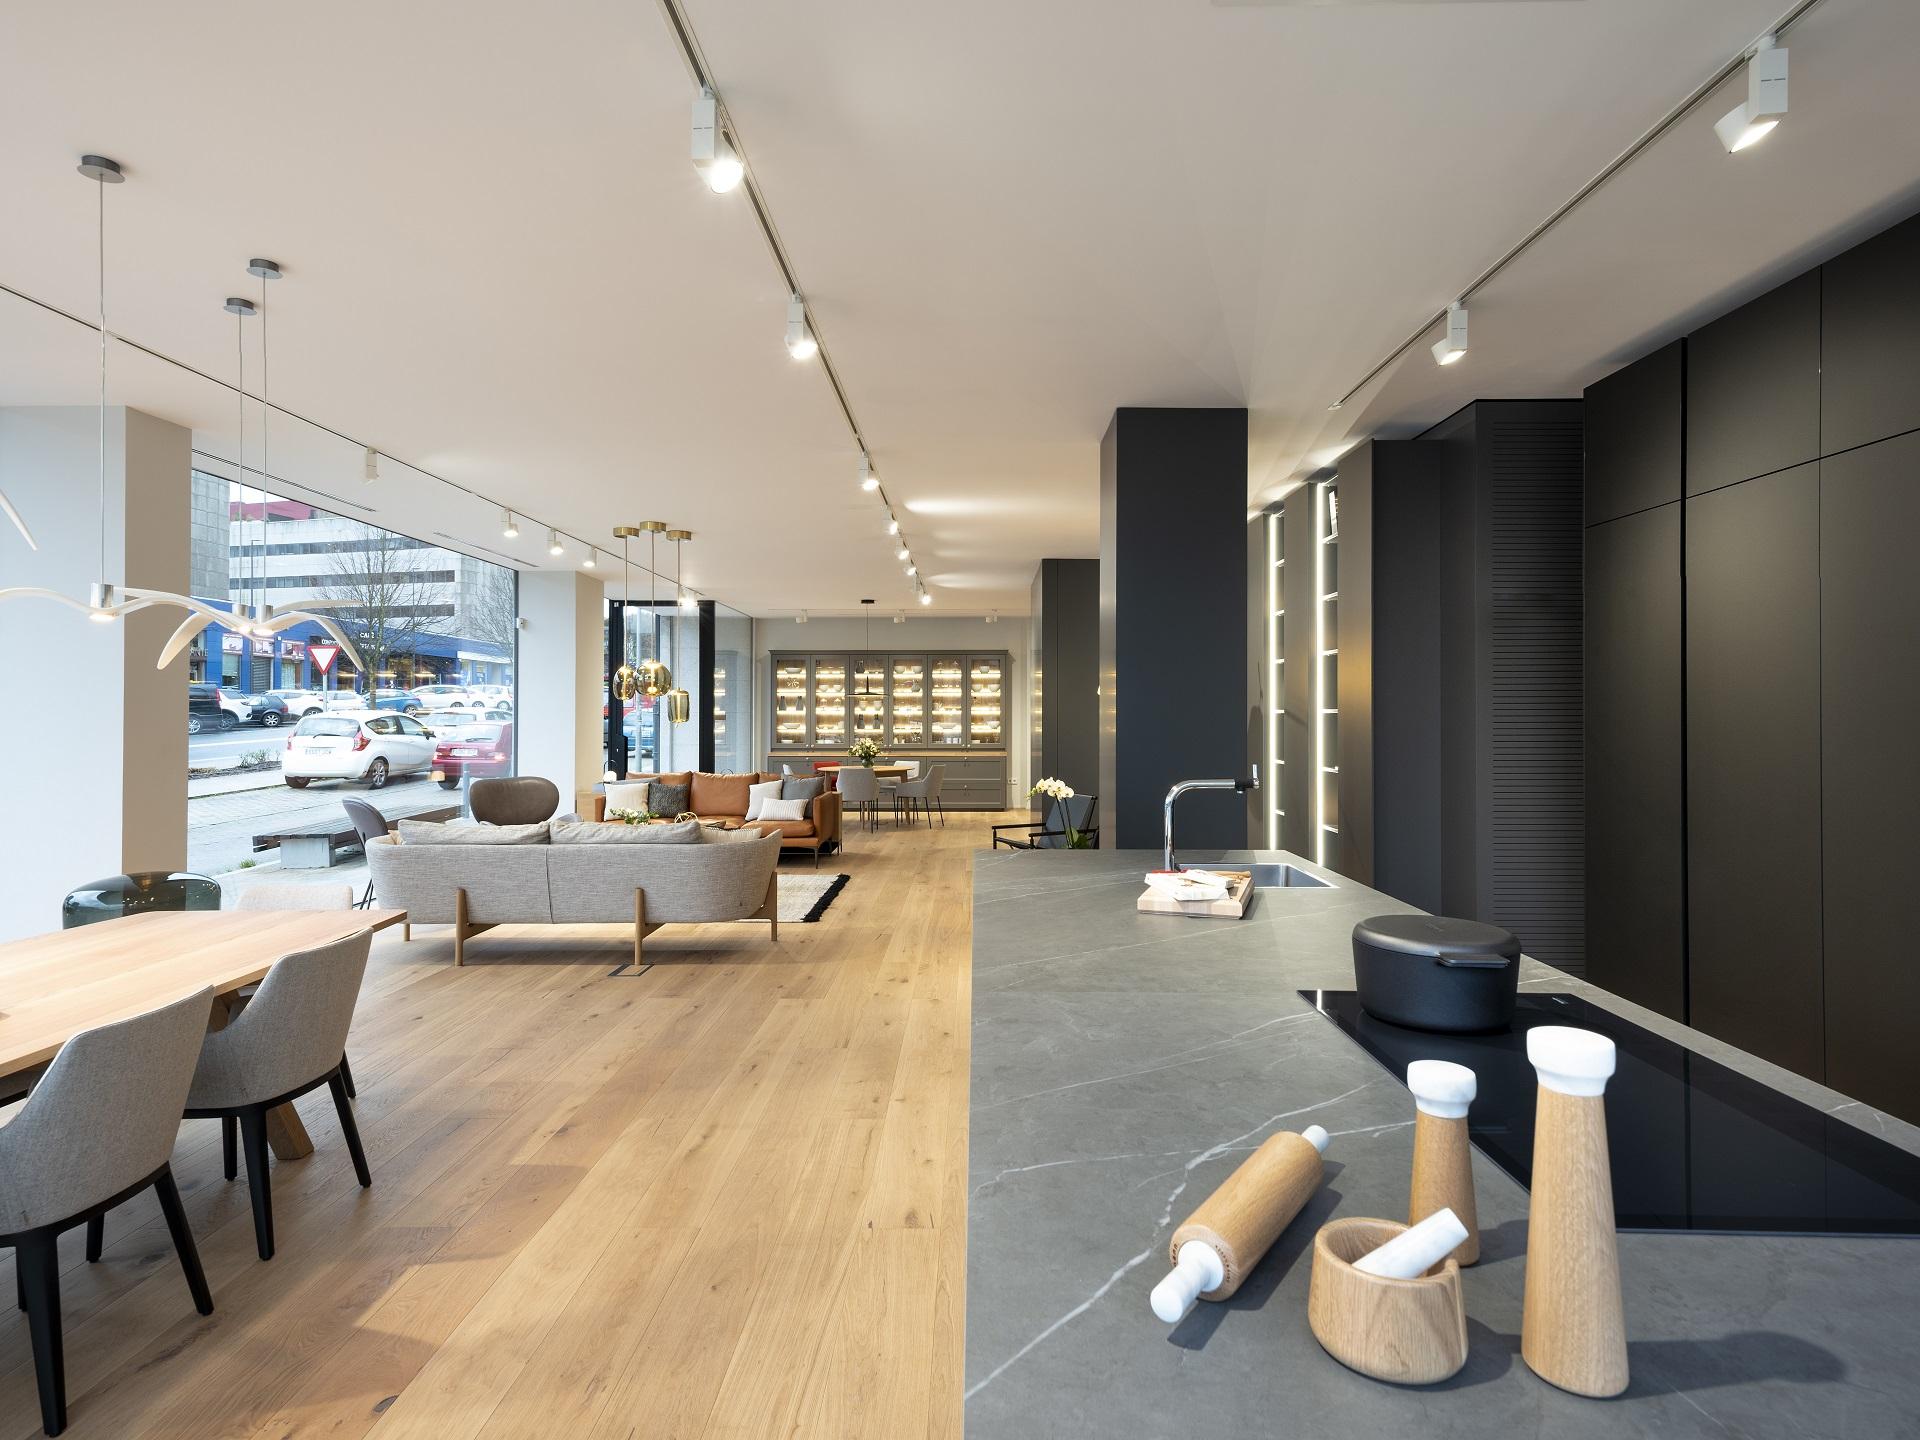 Exposición de cocinas Santos en Santiago Interiores